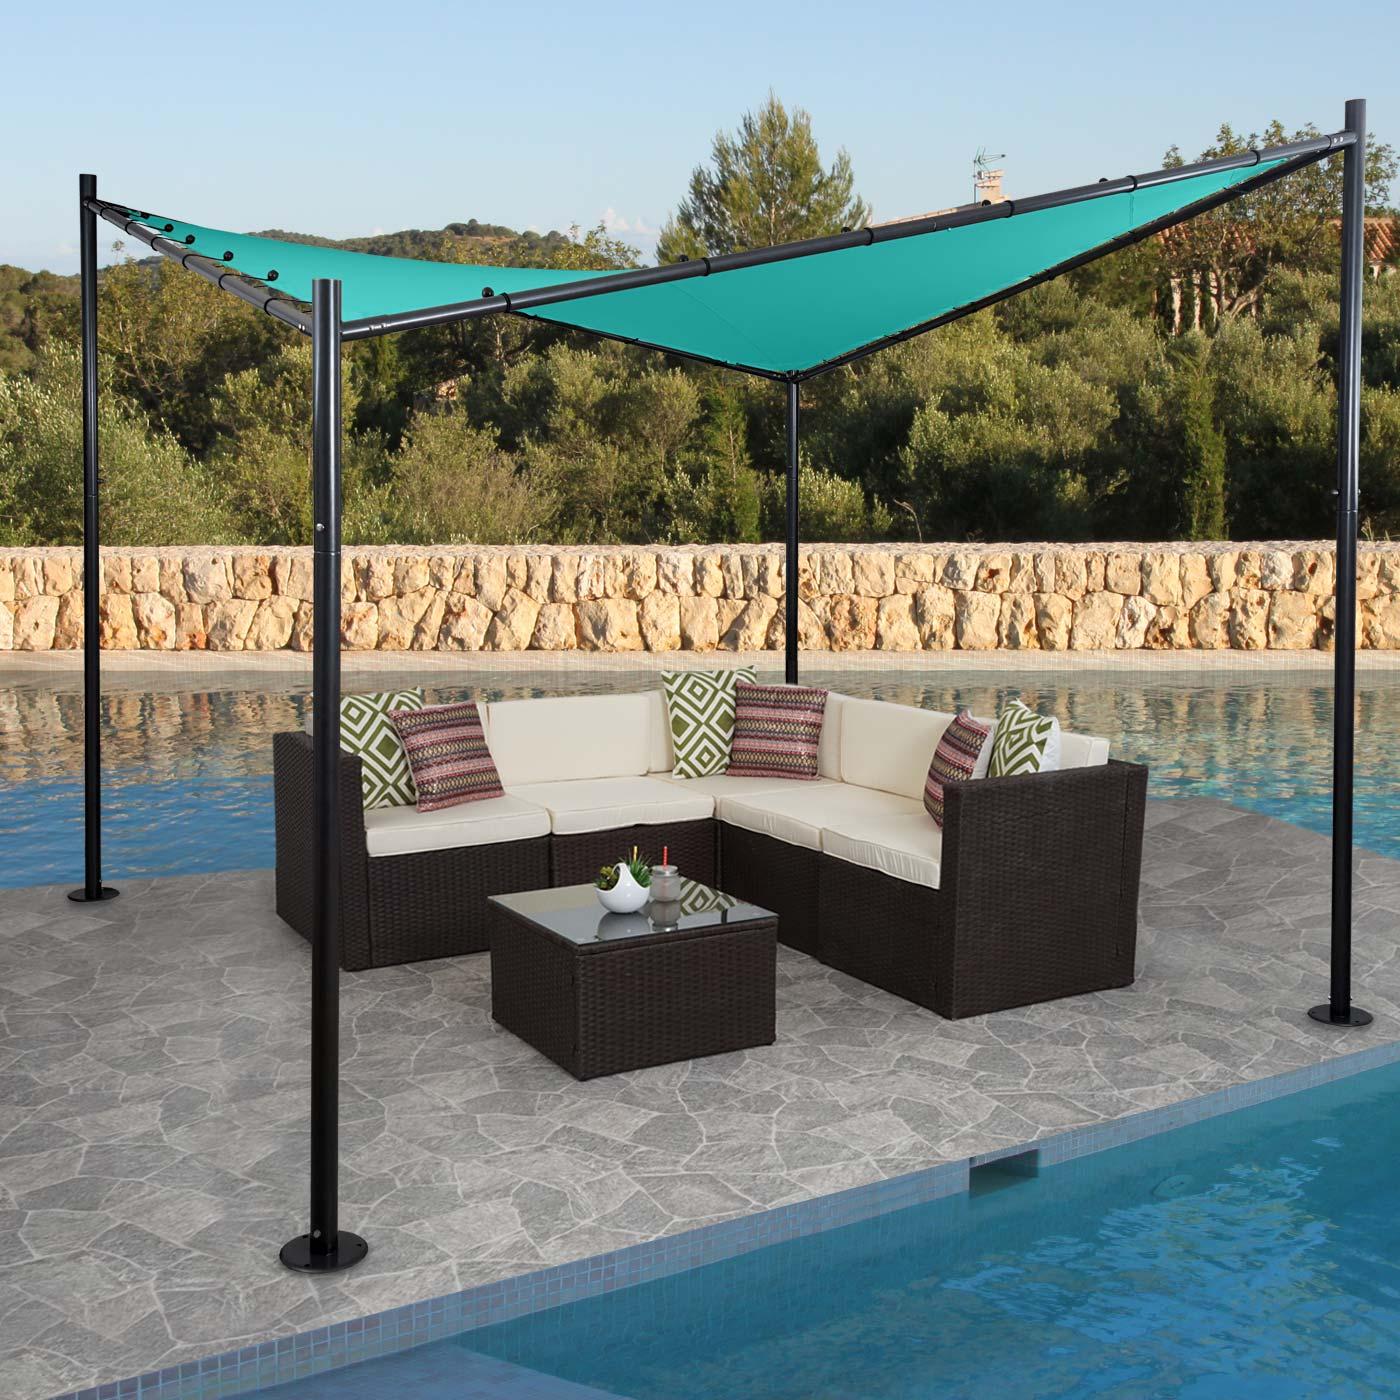 pergola hwc a41 garten pavillon sonnensegel stabiles stahl gestell 3x3m t rkis. Black Bedroom Furniture Sets. Home Design Ideas